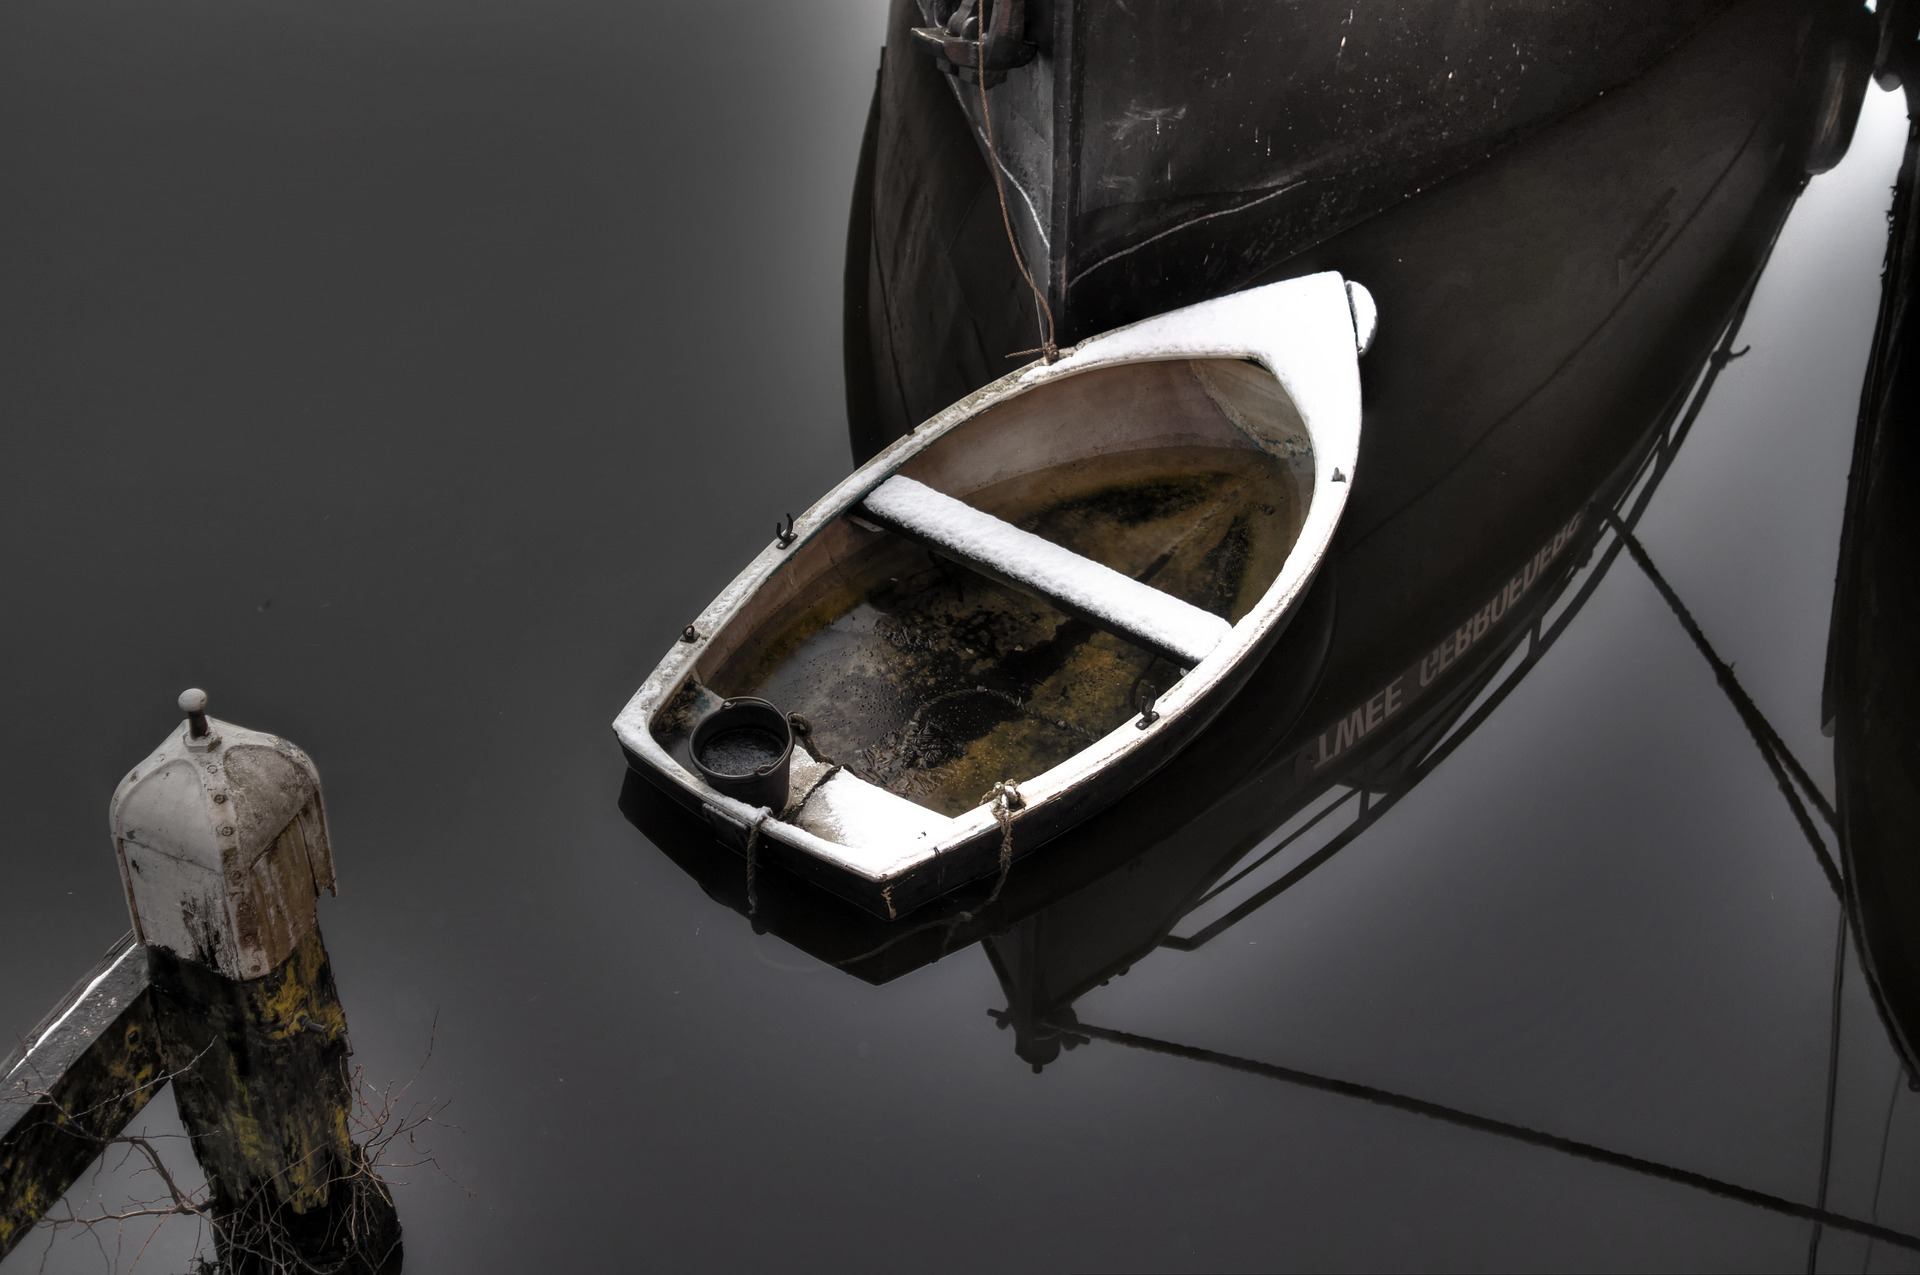 boat-1185743_1920.jpg